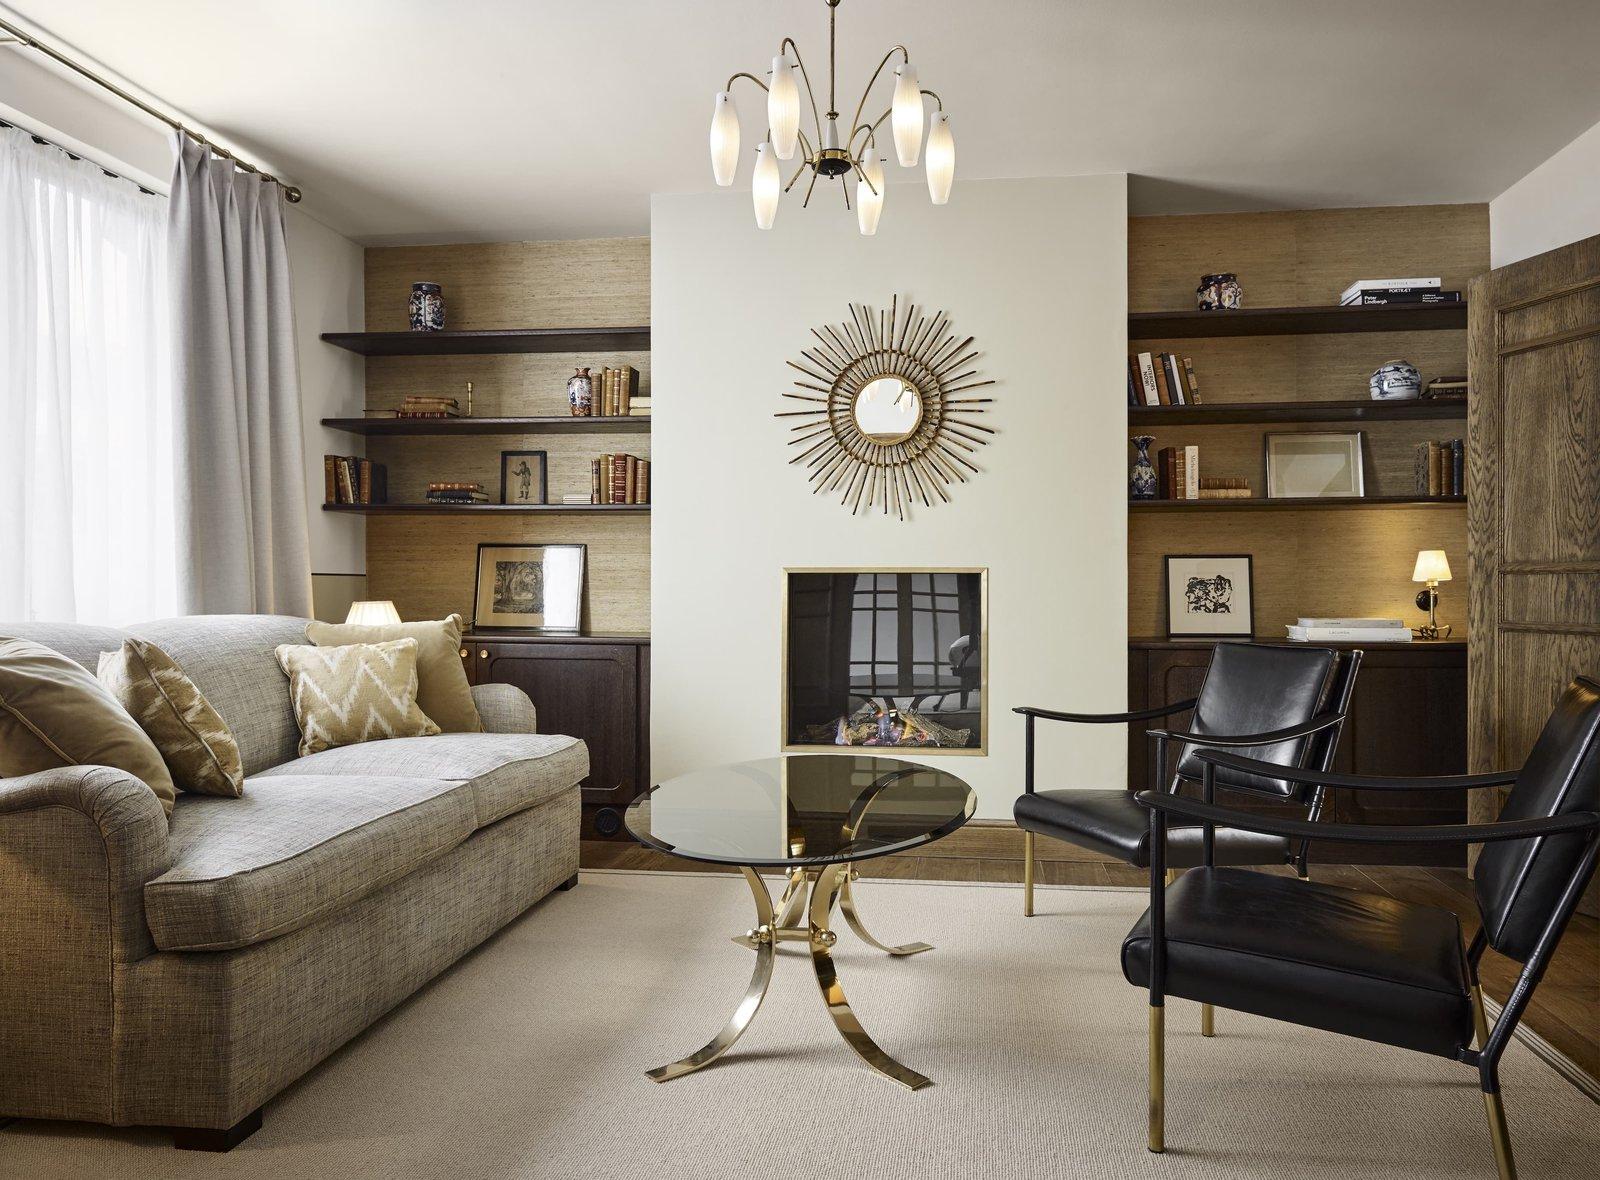 Living Room, Sofa, Shelves, Medium Hardwood Floor, Pendant Lighting, Table Lighting, Coffee Tables, Rug Floor, Chair, and Standard Layout Fireplace  Hotel Sanders